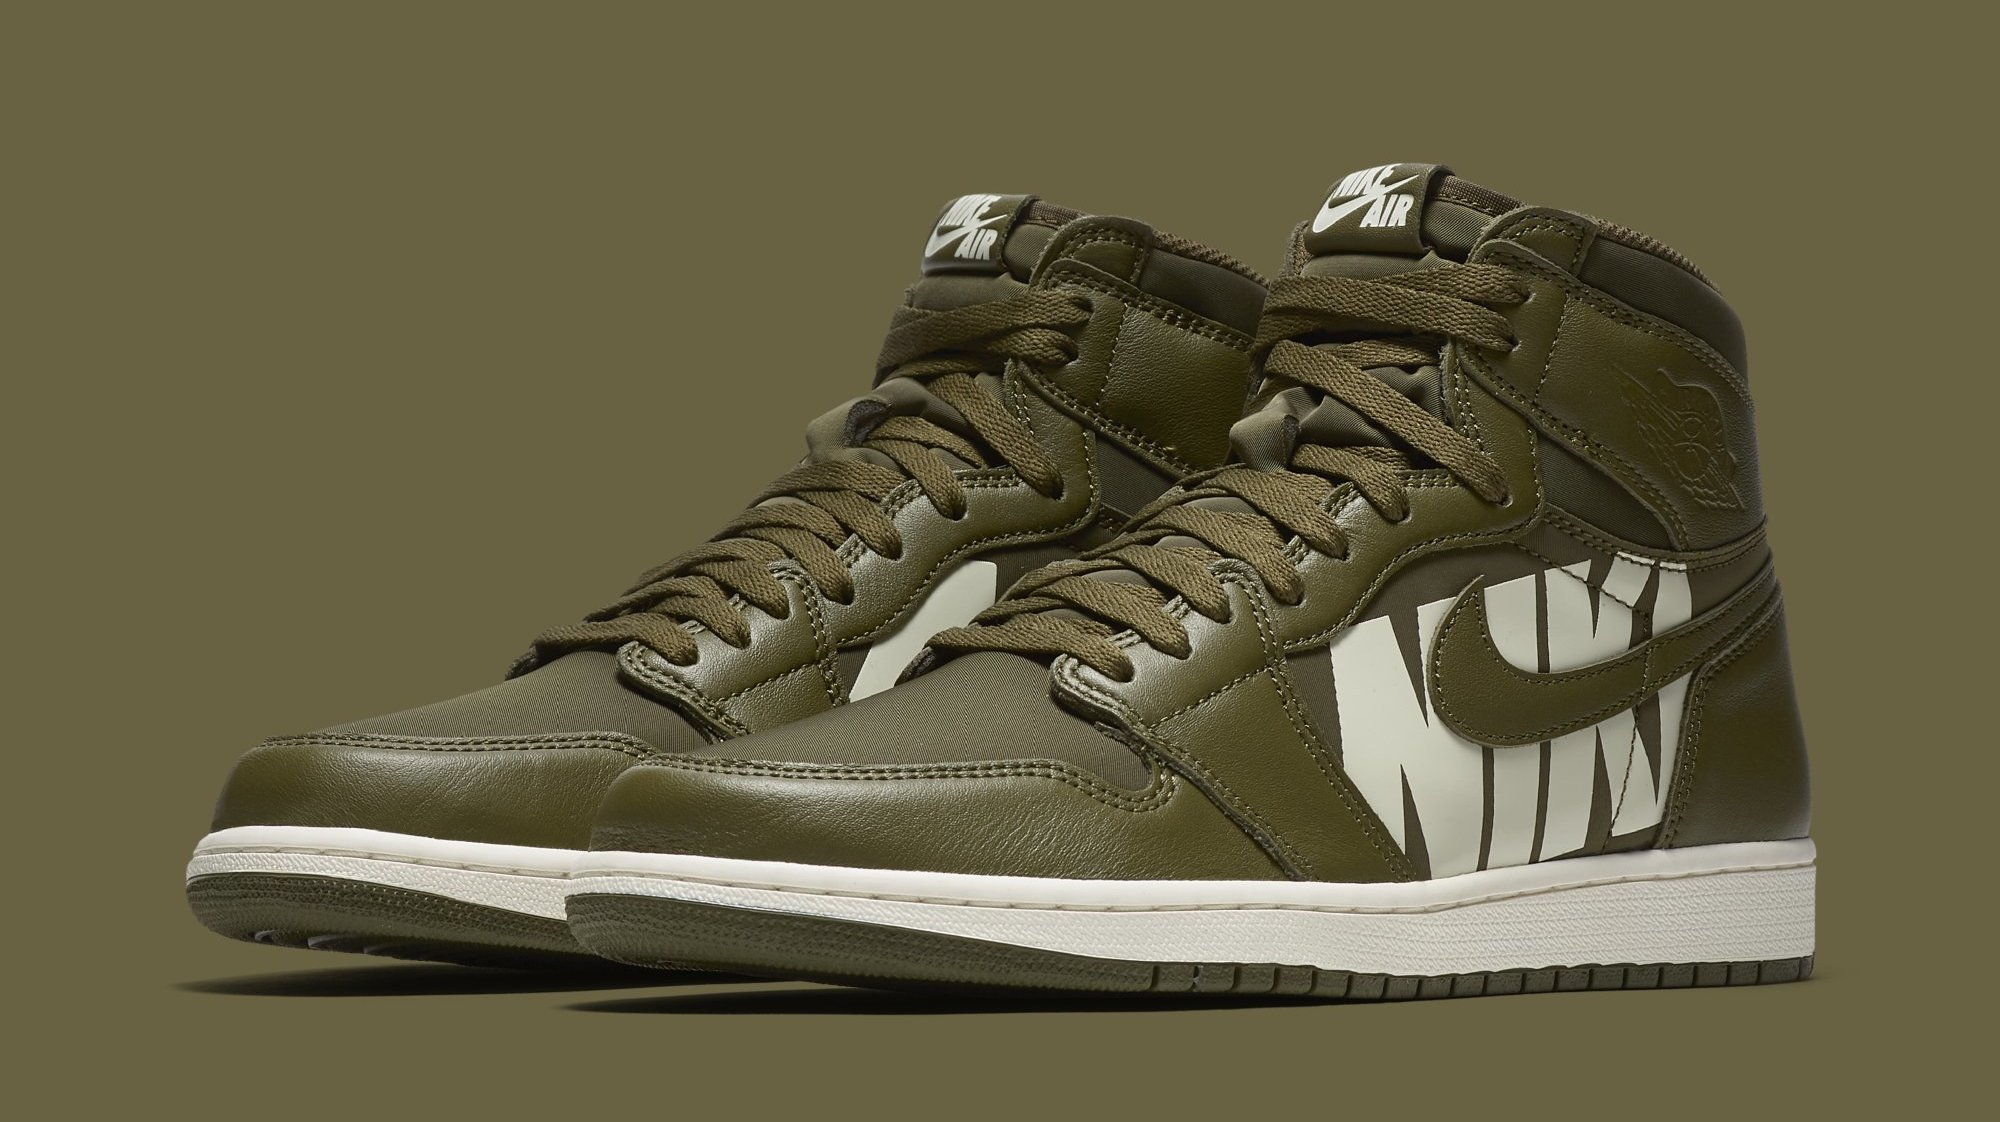 0ba3b0786d15eb Air Jordan 1 High OG  Nike Air  Pack Release Date 555088-800 555088 ...